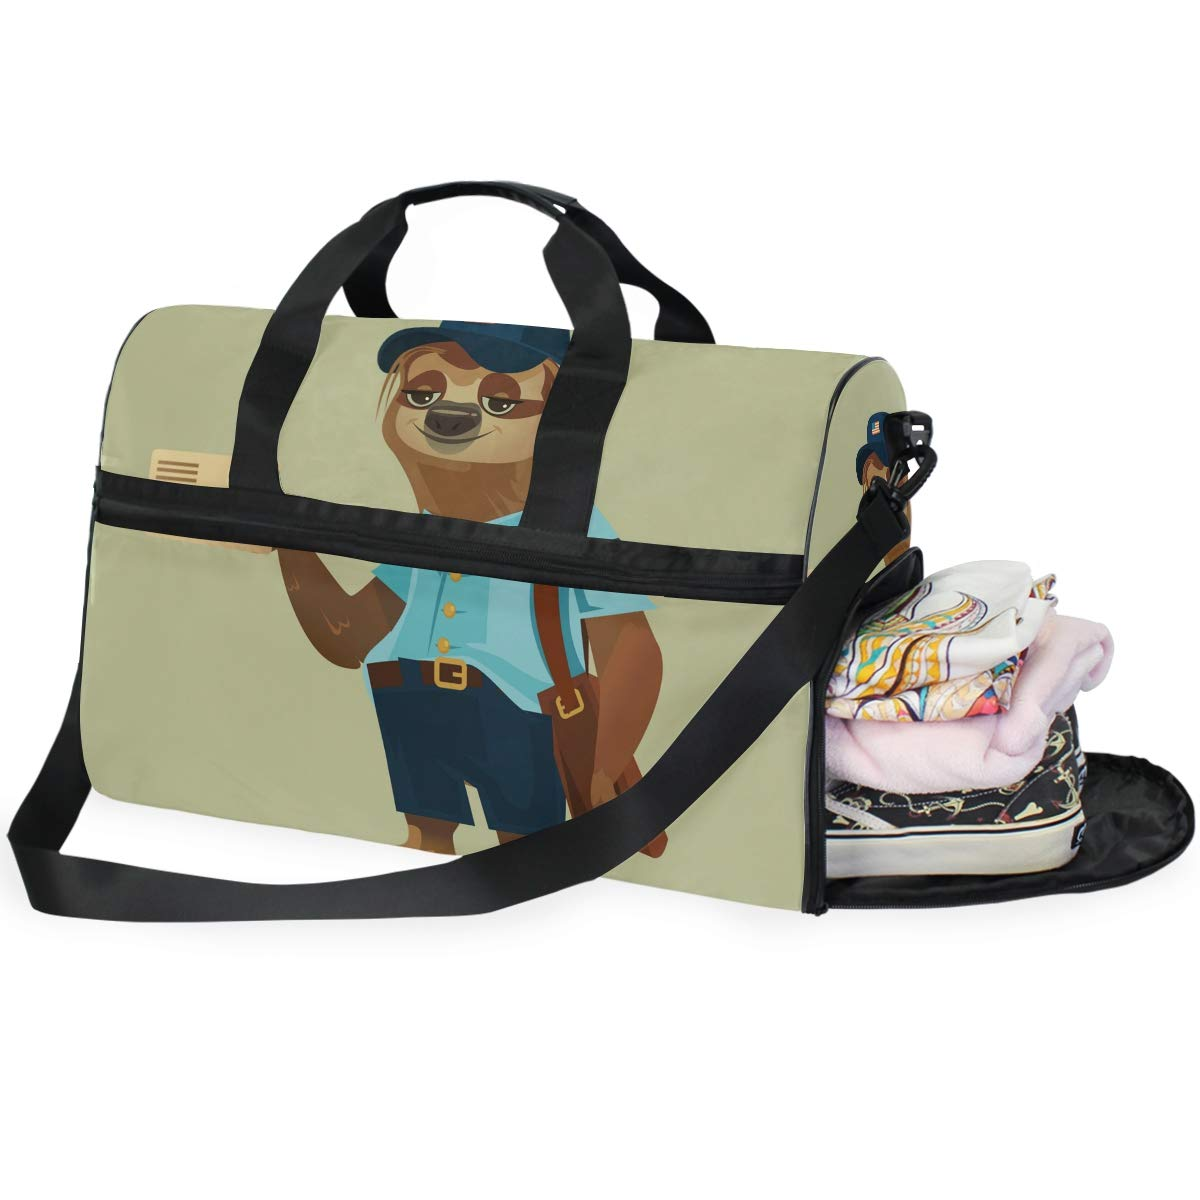 Gym Vacation Travel Duffel Bag Lazy Sloth Postman Animal Fun Waterproof Lightweight Luggage bag for Sports